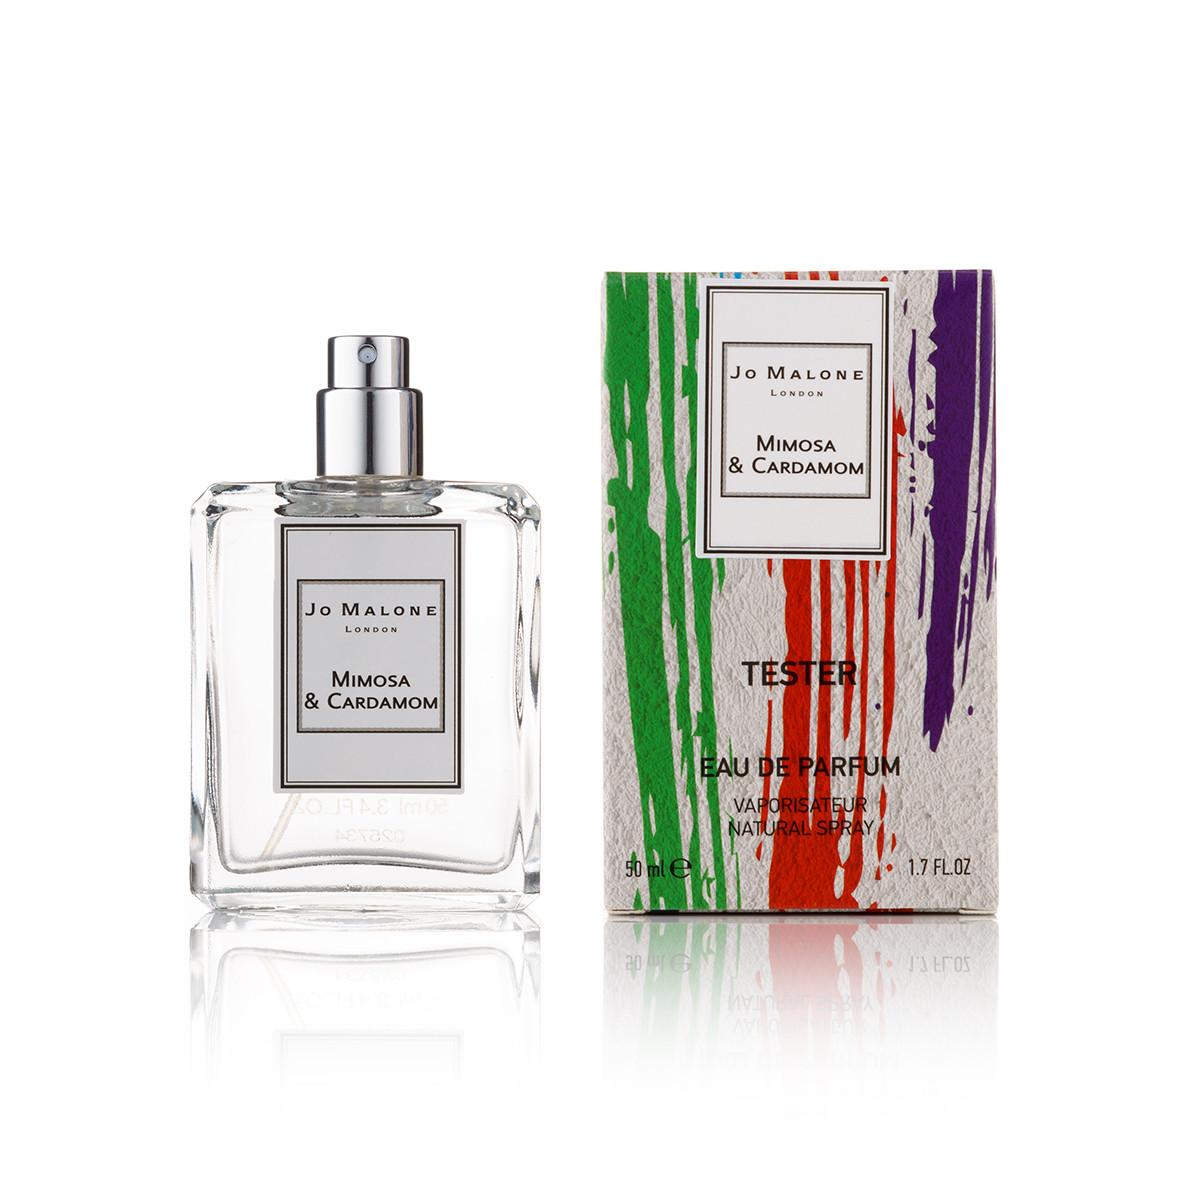 Jo Malone Mimosa And Cardamom парфюм унисекс тестер 50 ml  ОАЭ (реплика)